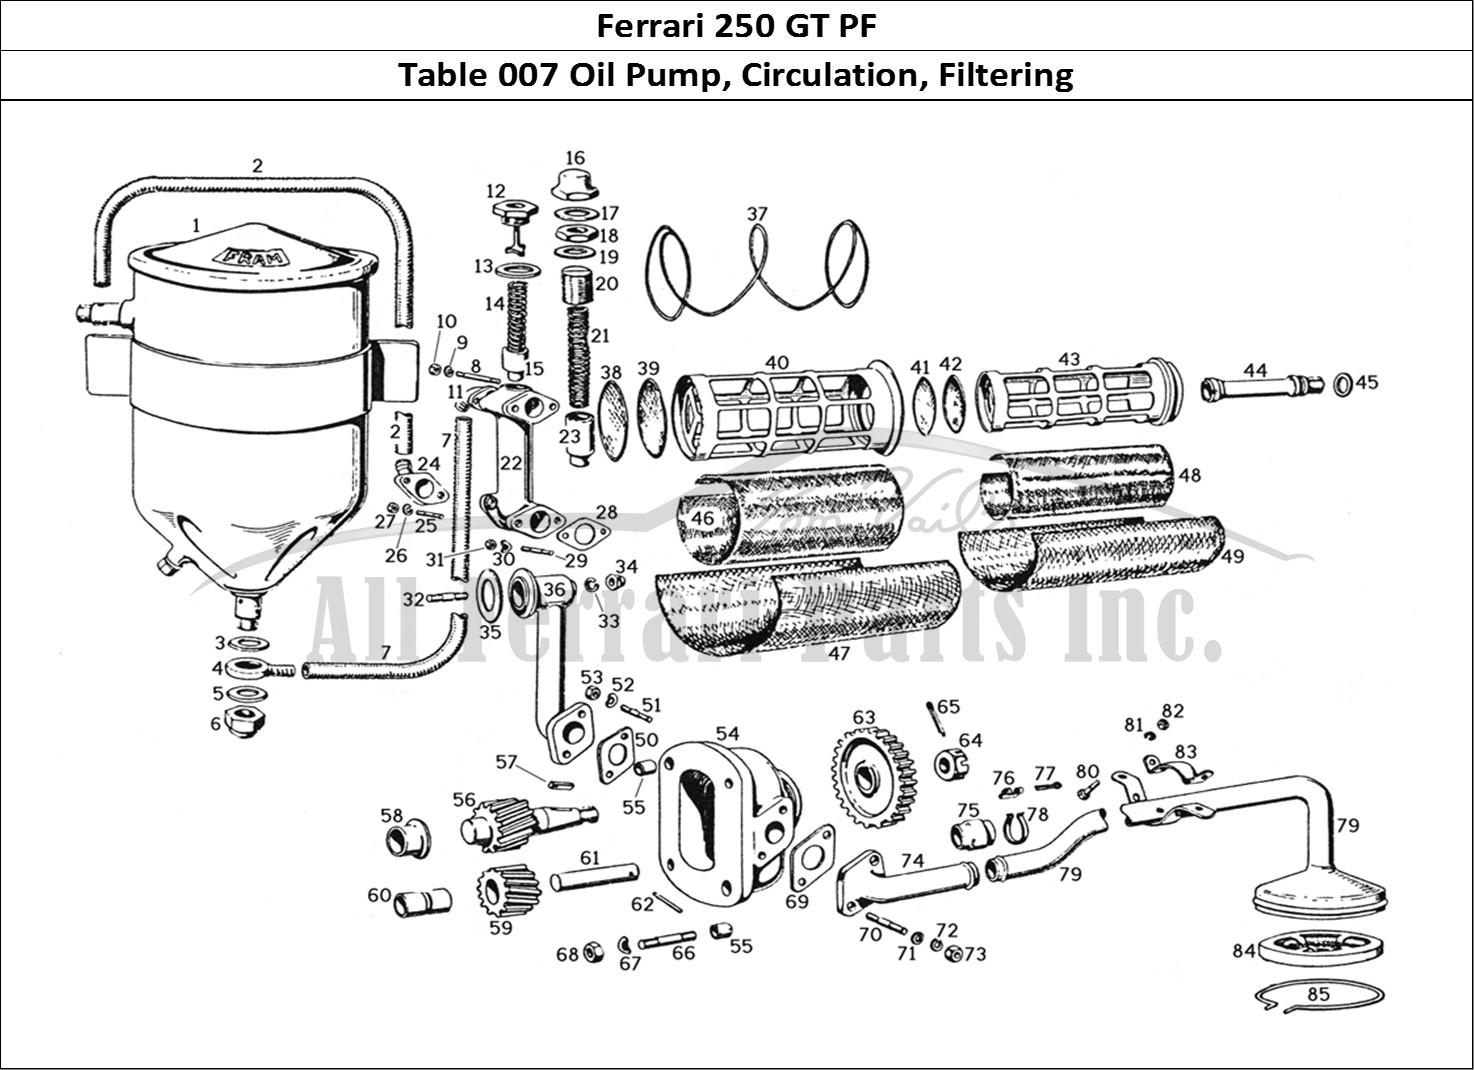 Buy original Ferrari 250 GT PF 007 Oil Pump, Circulation